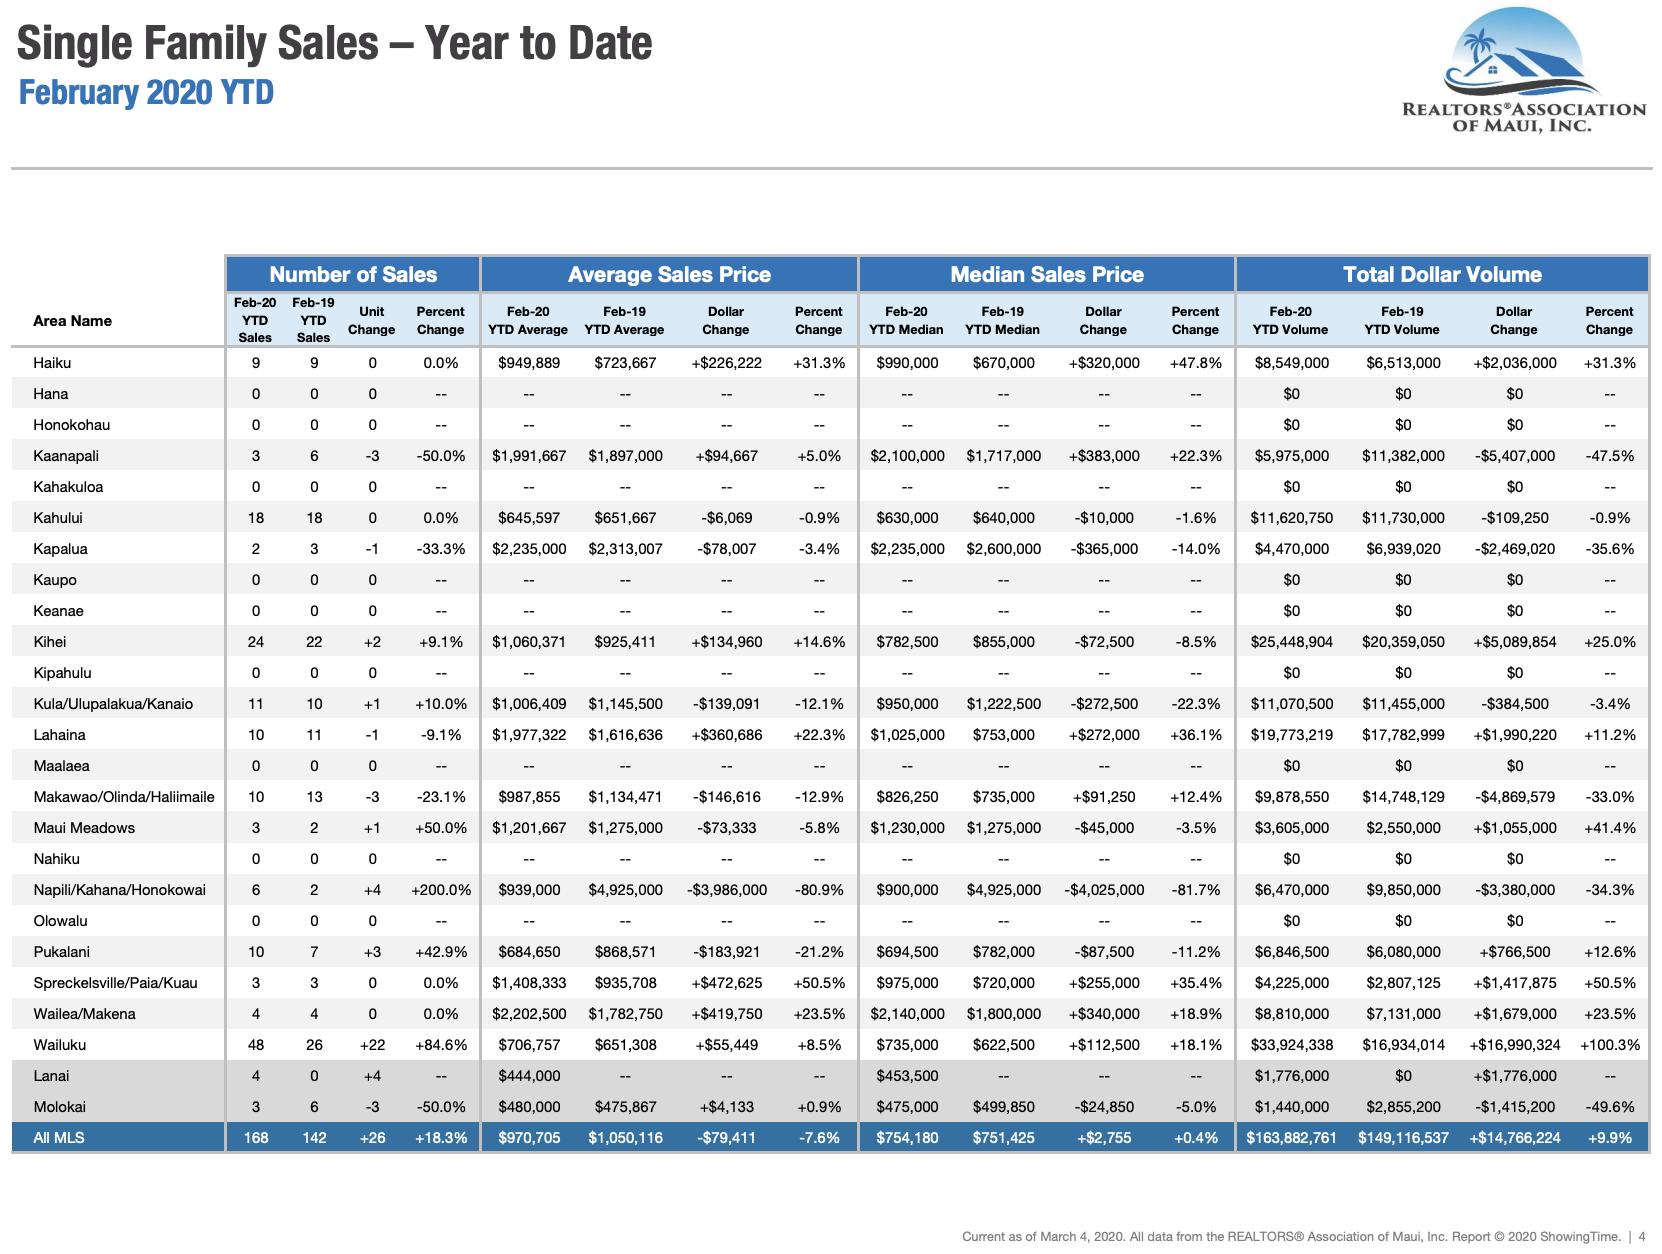 Maui Hawaii single family home sale statistics through February 2020.